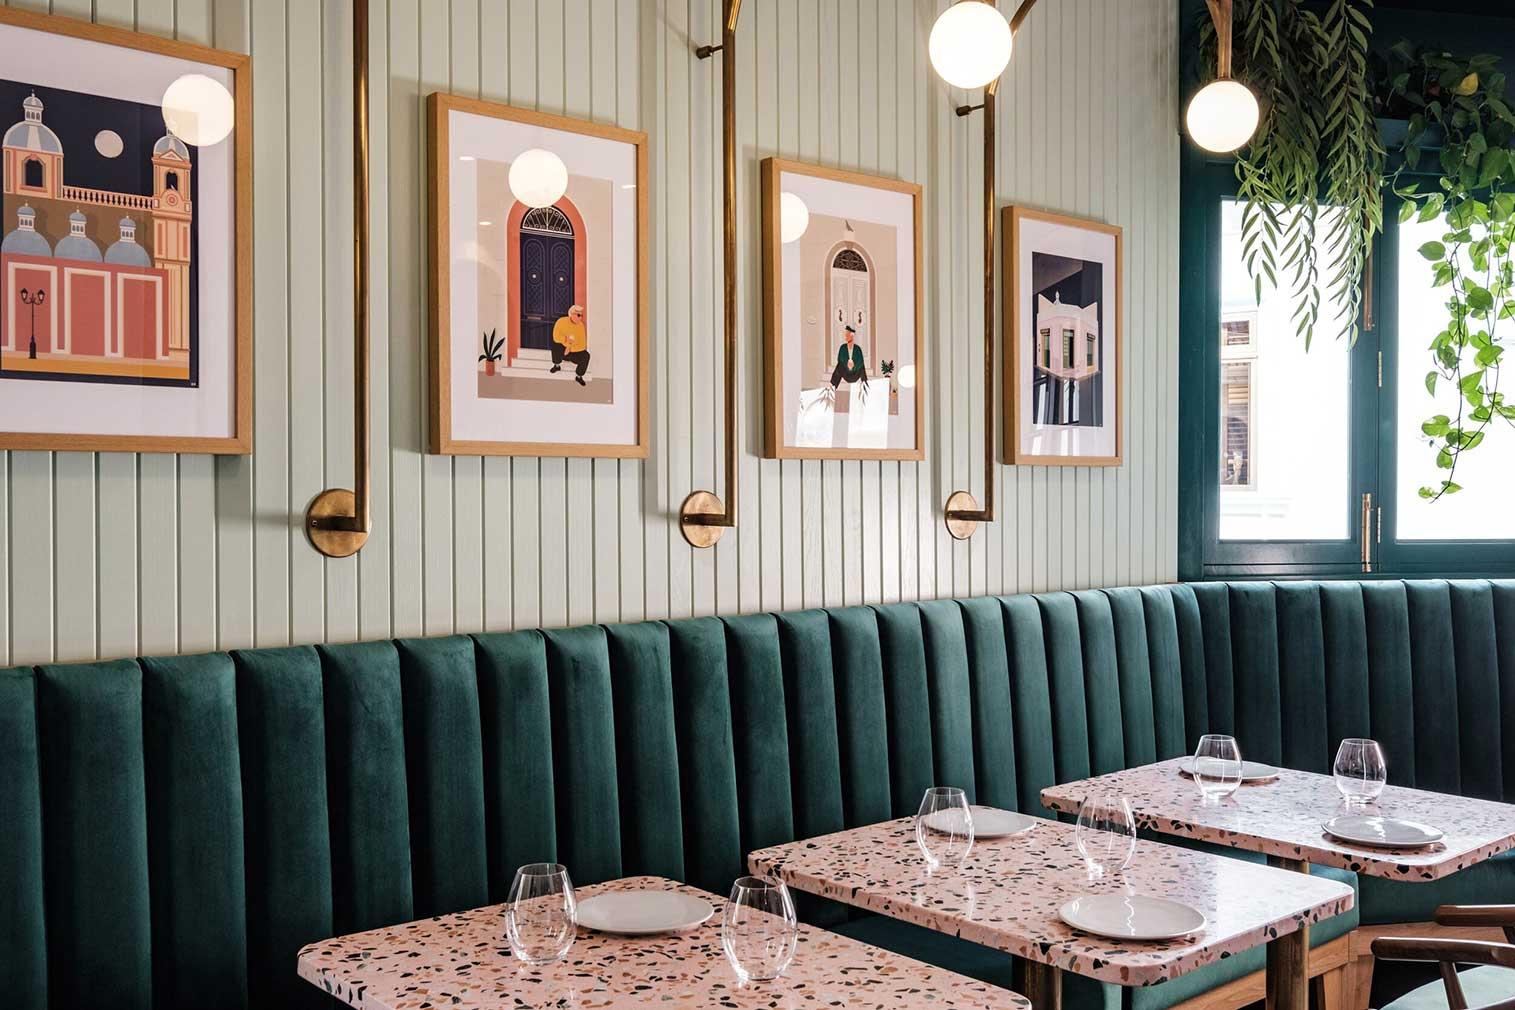 Malta's Barbajean restaurant is a jewellery-box of colours